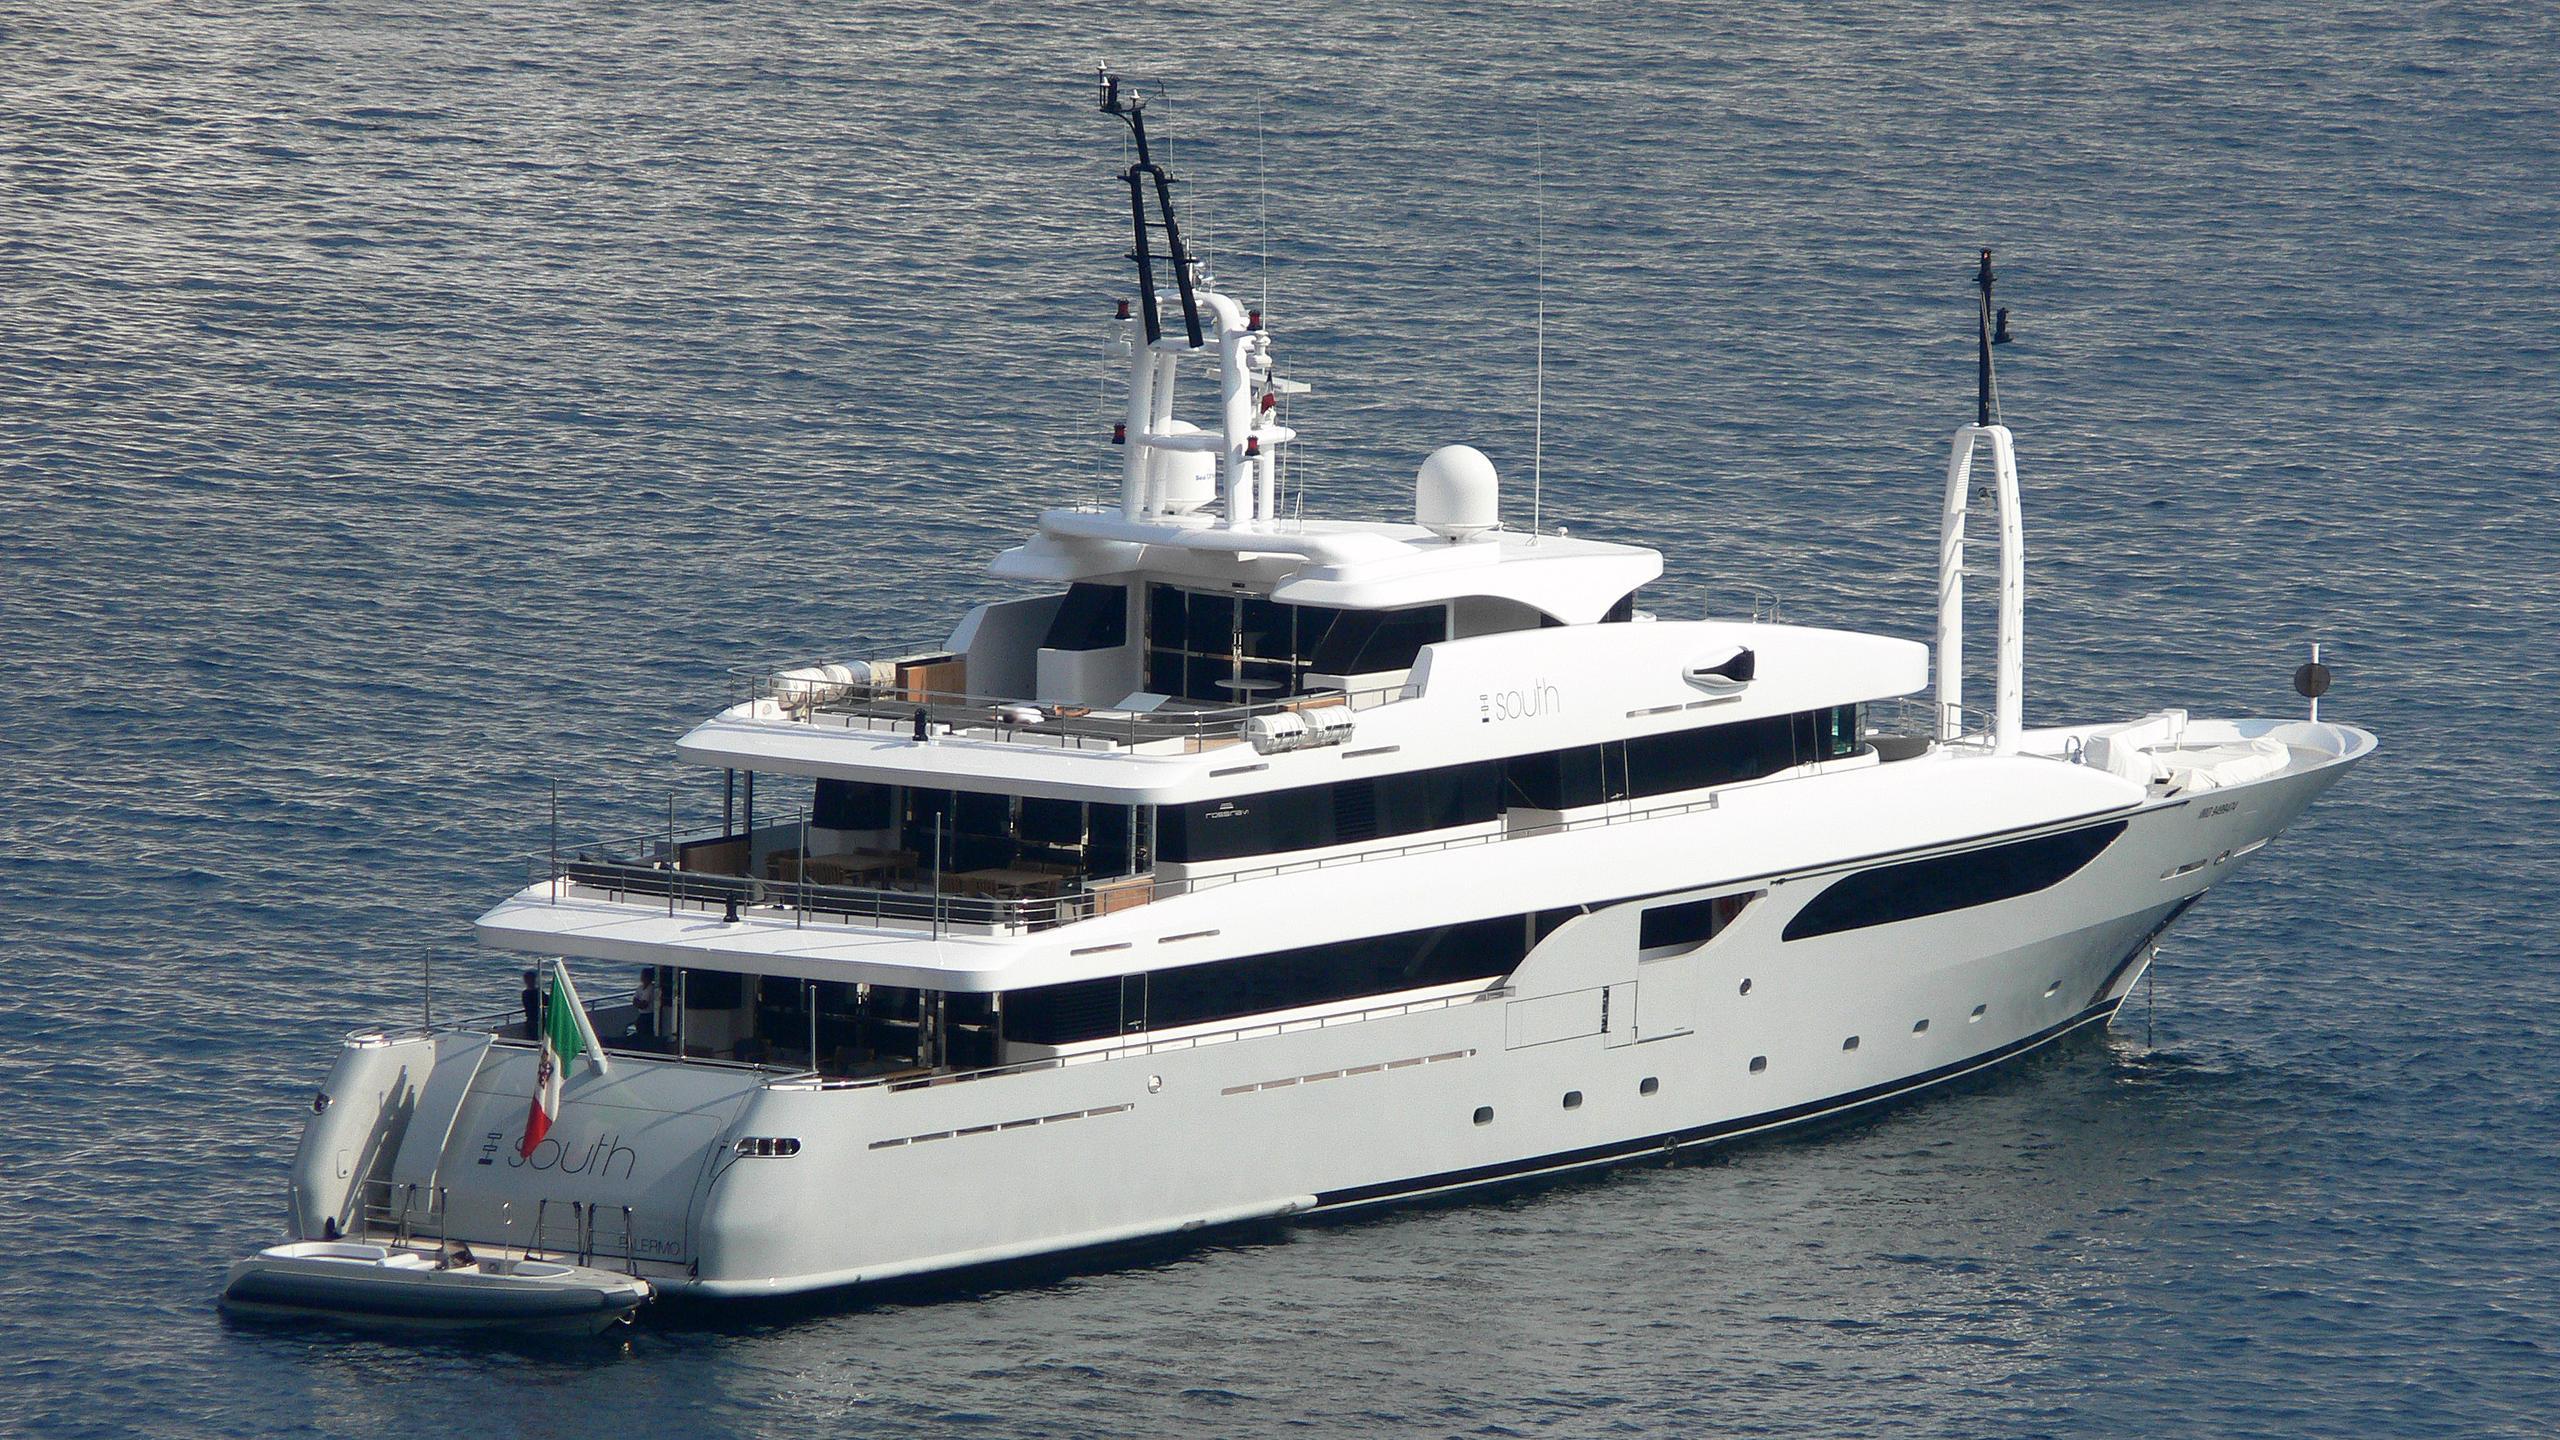 rarity-syna-south-motor-yacht-rossinavi-2008-53m-stern